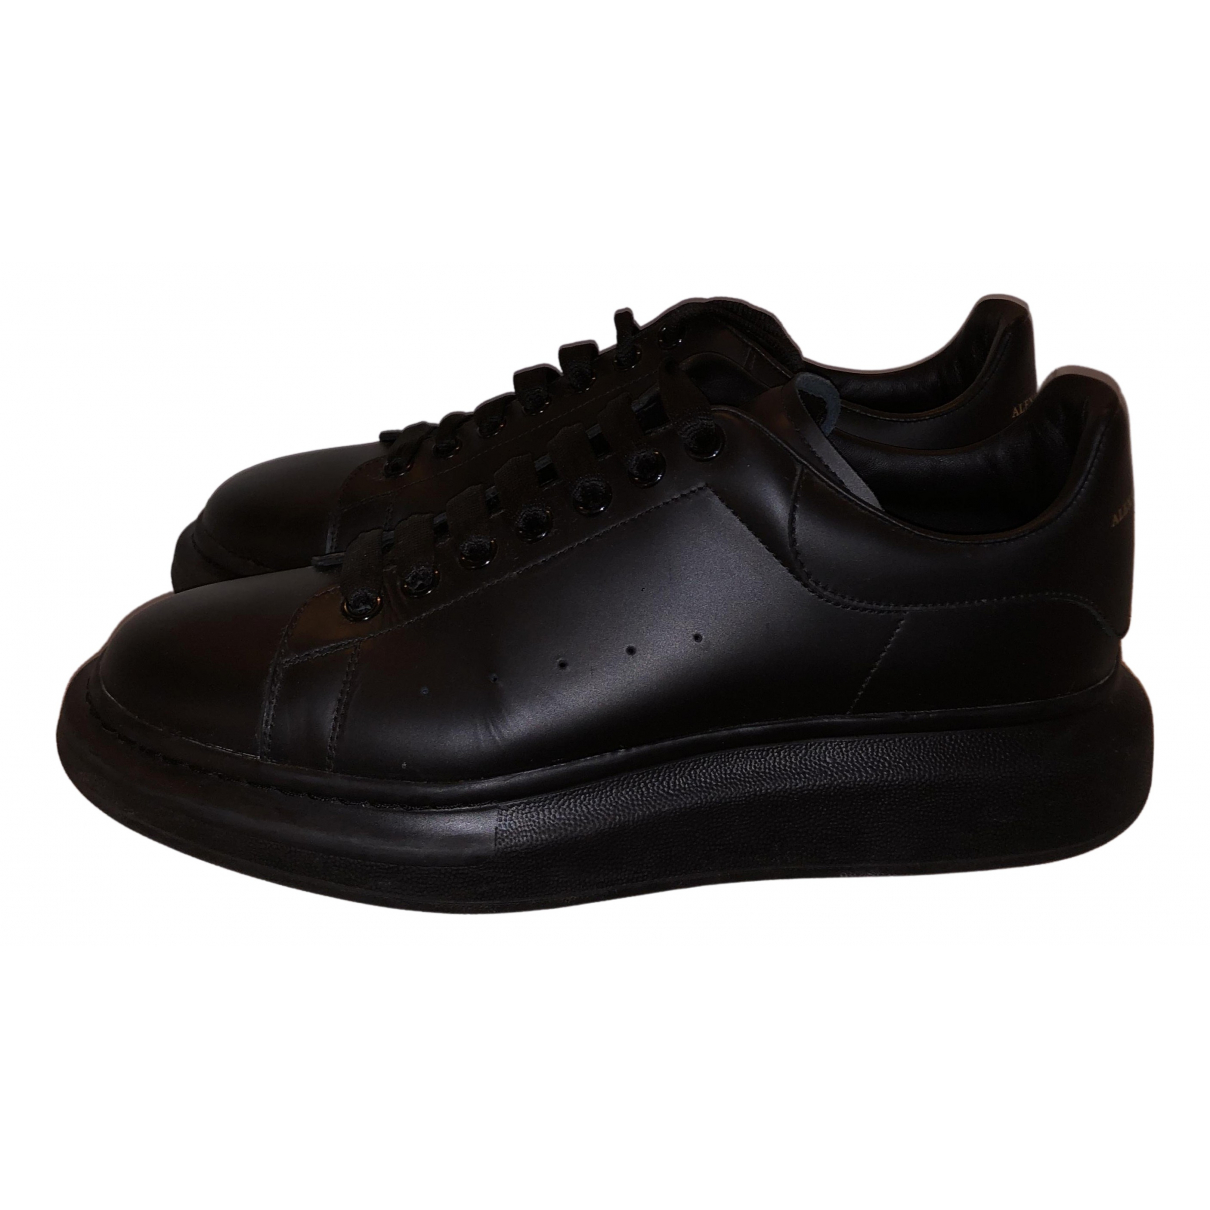 Alexander Mcqueen - Baskets Oversize pour homme en cuir - noir